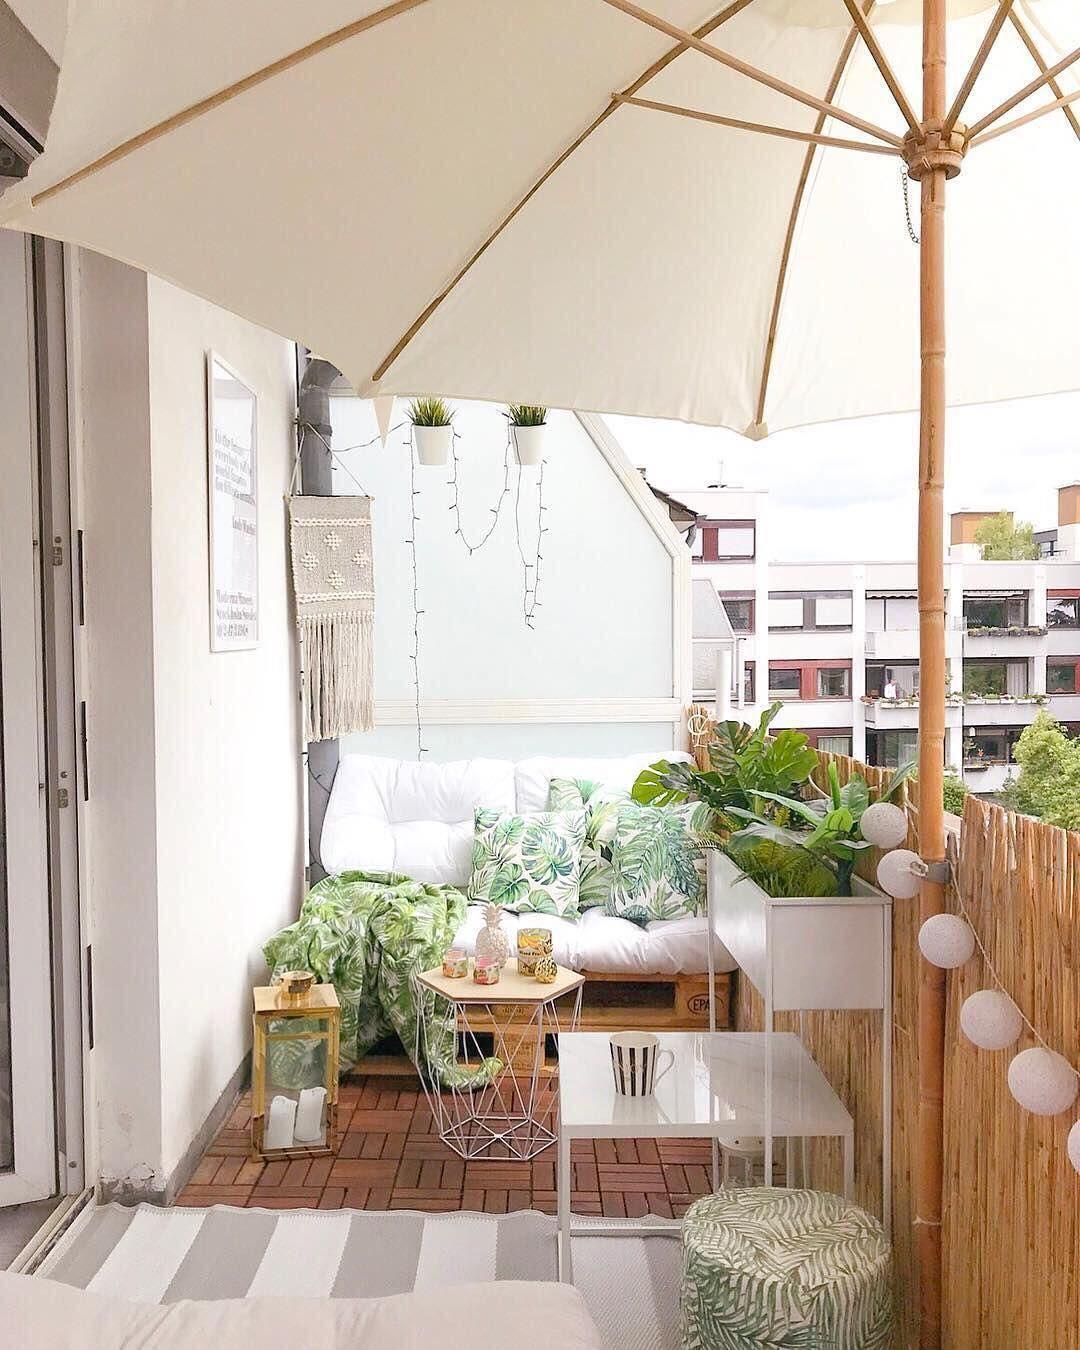 Eurem Balkon Oder Terrasse Fehlt Noch Der Letzte Sommer Feinschliff Dann Schaut Mal Uber Small Balcony Decor Apartment Balcony Decorating Balcony Furniture